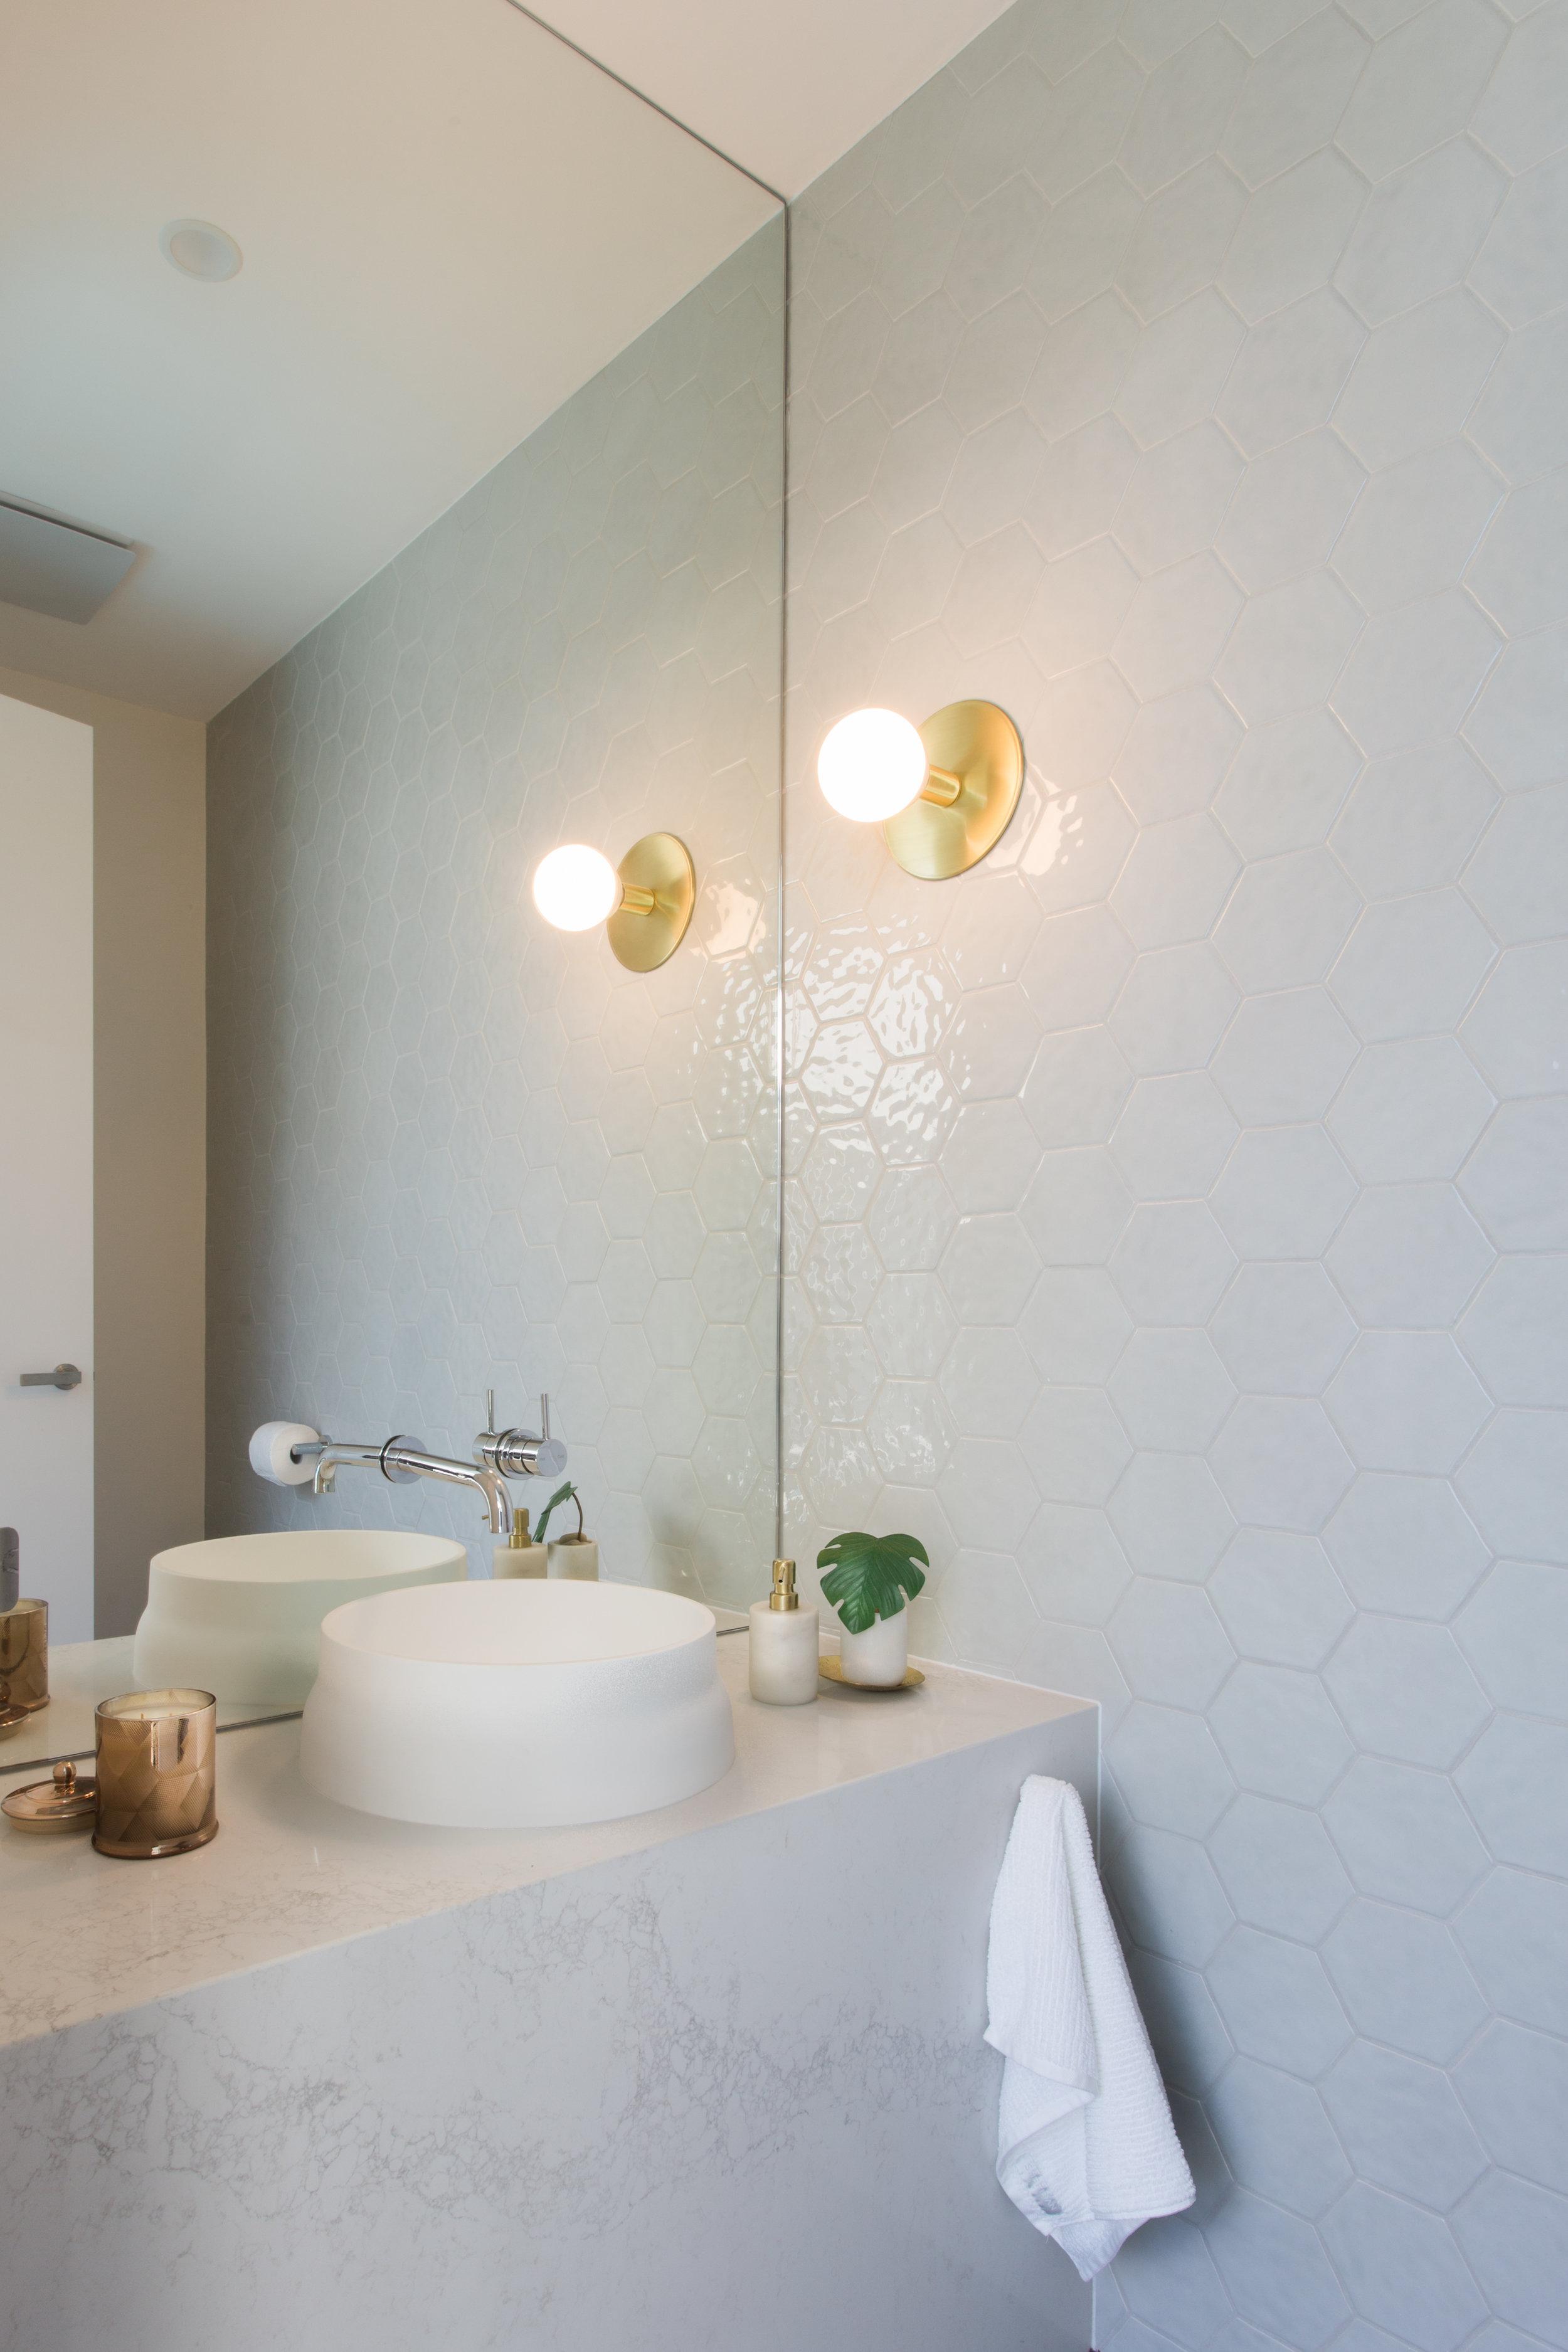 bathroomwallsconcevanityview.jpg